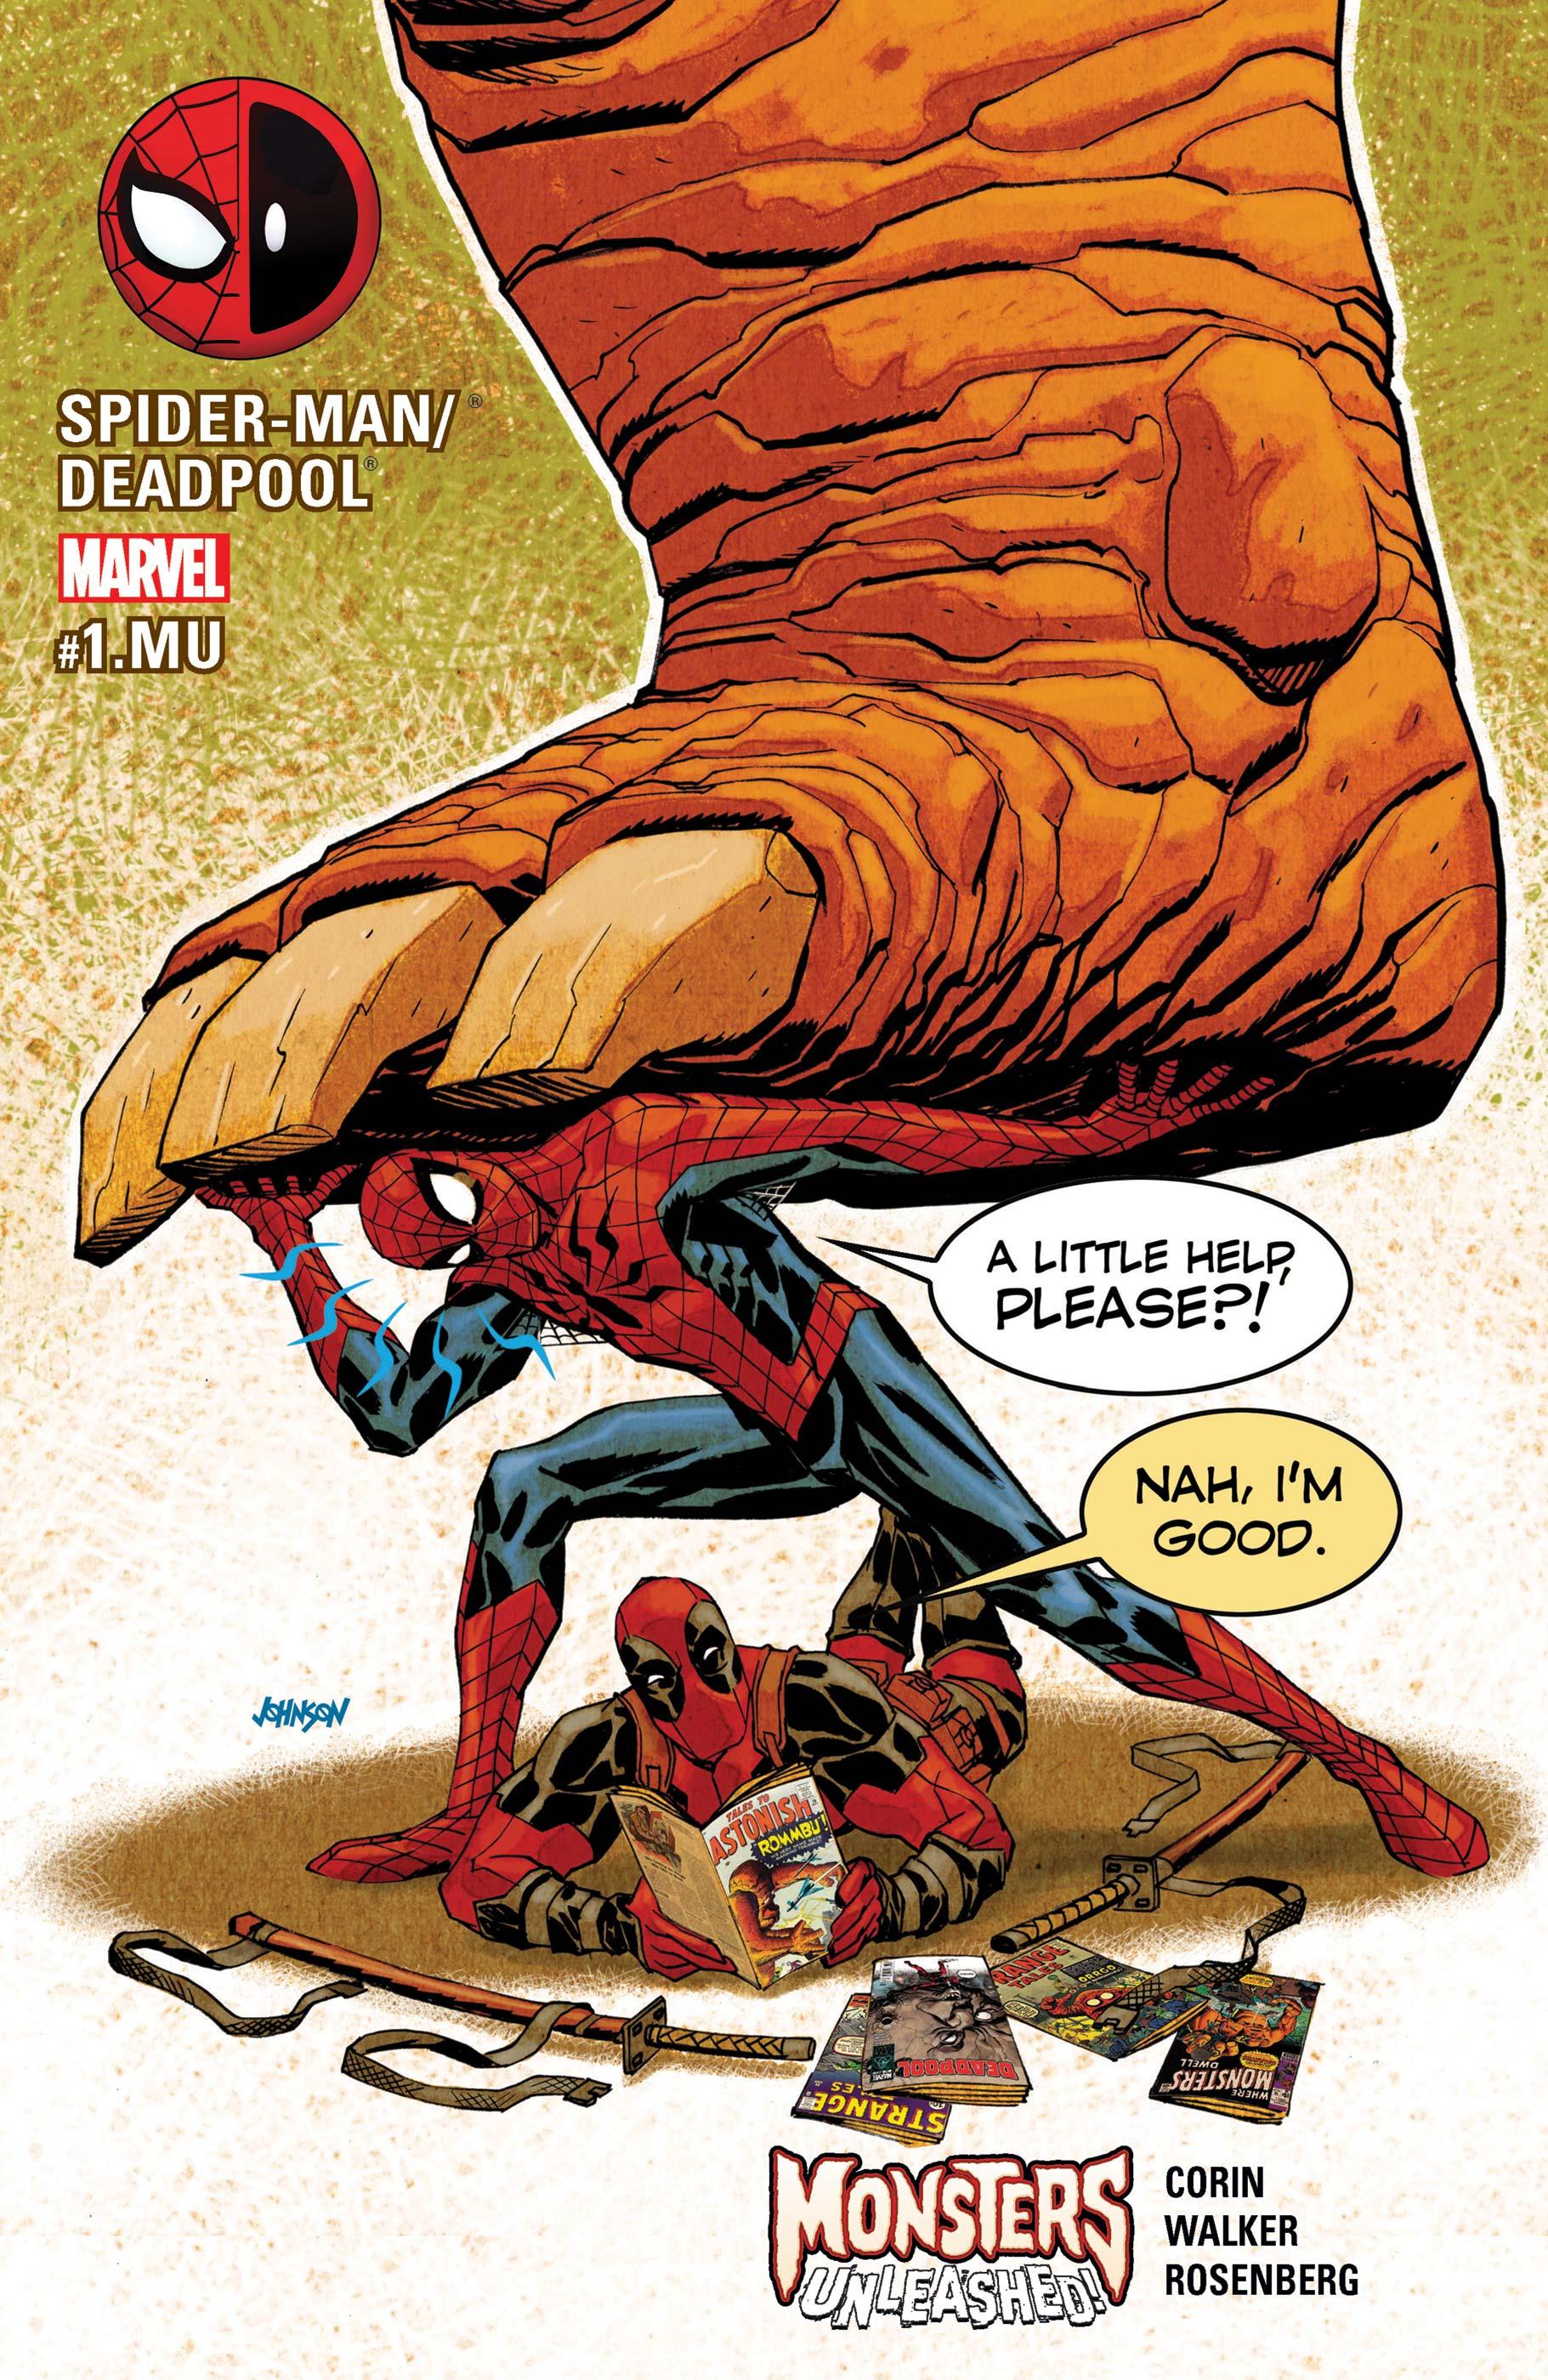 Spider-Man/Deadpool (2016) #1.1